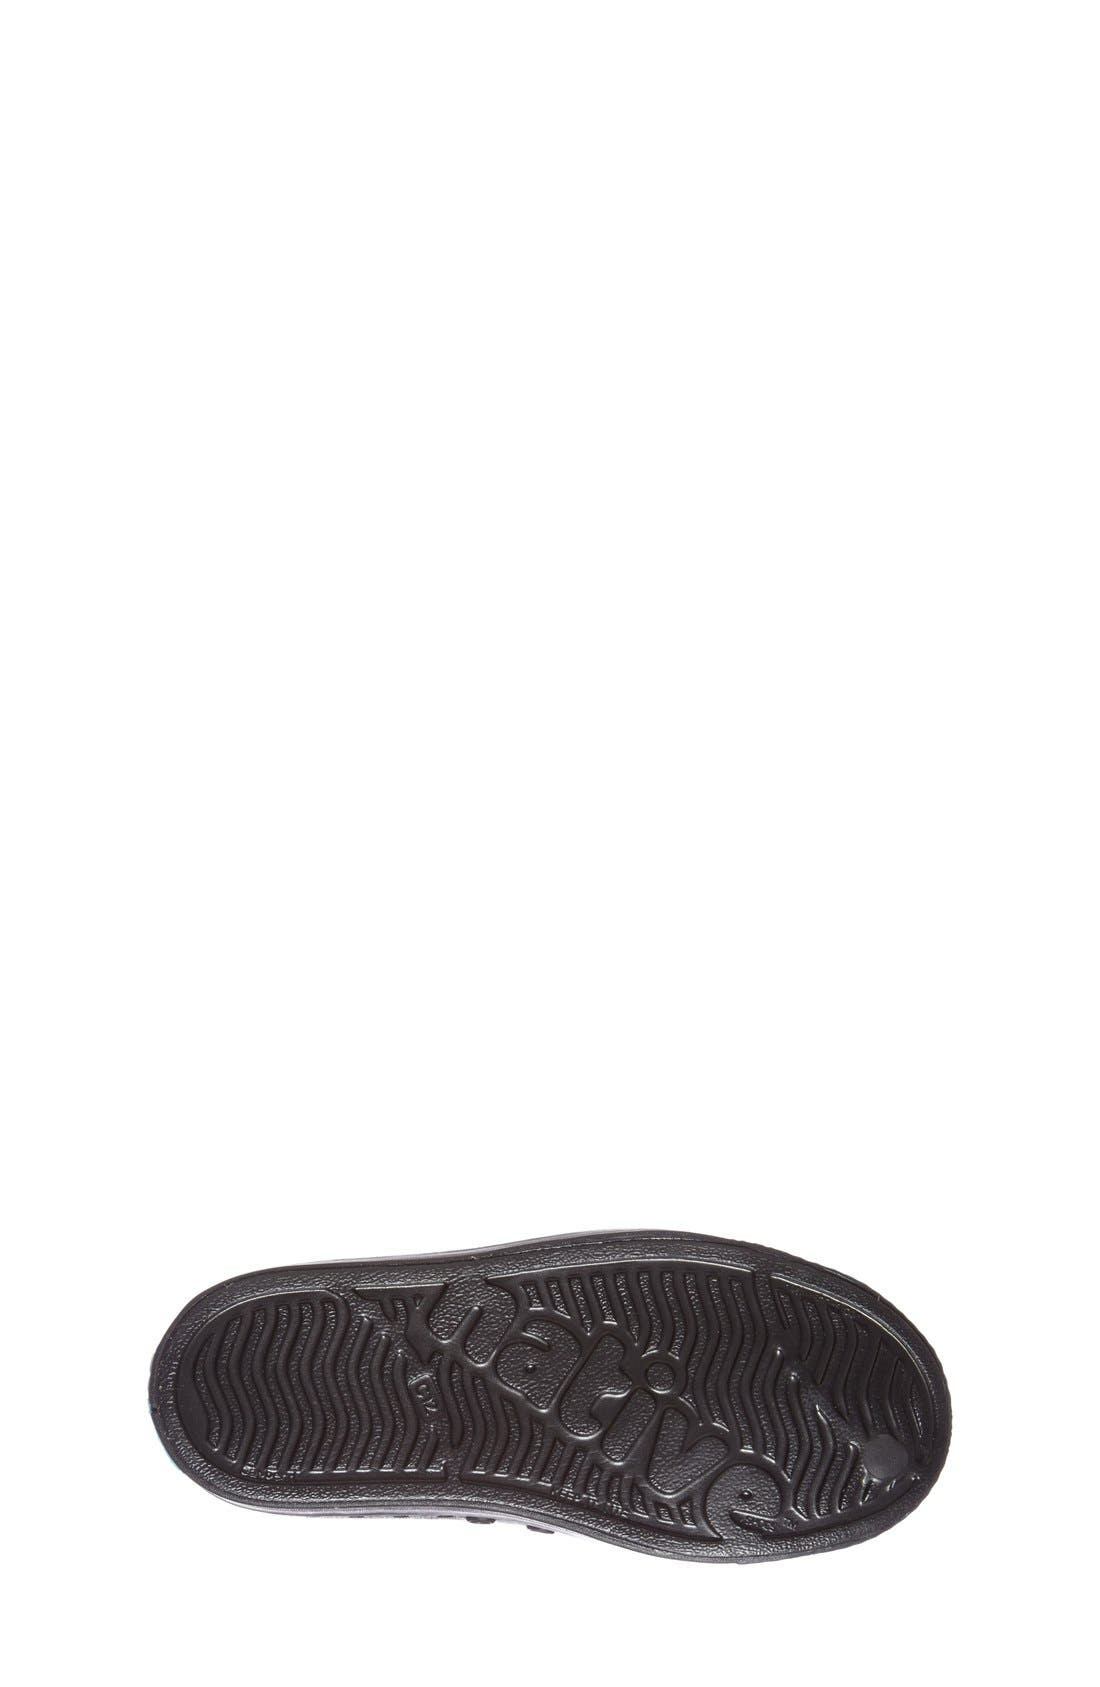 'Jefferson' Water Friendly Slip-On Sneaker,                             Alternate thumbnail 188, color,